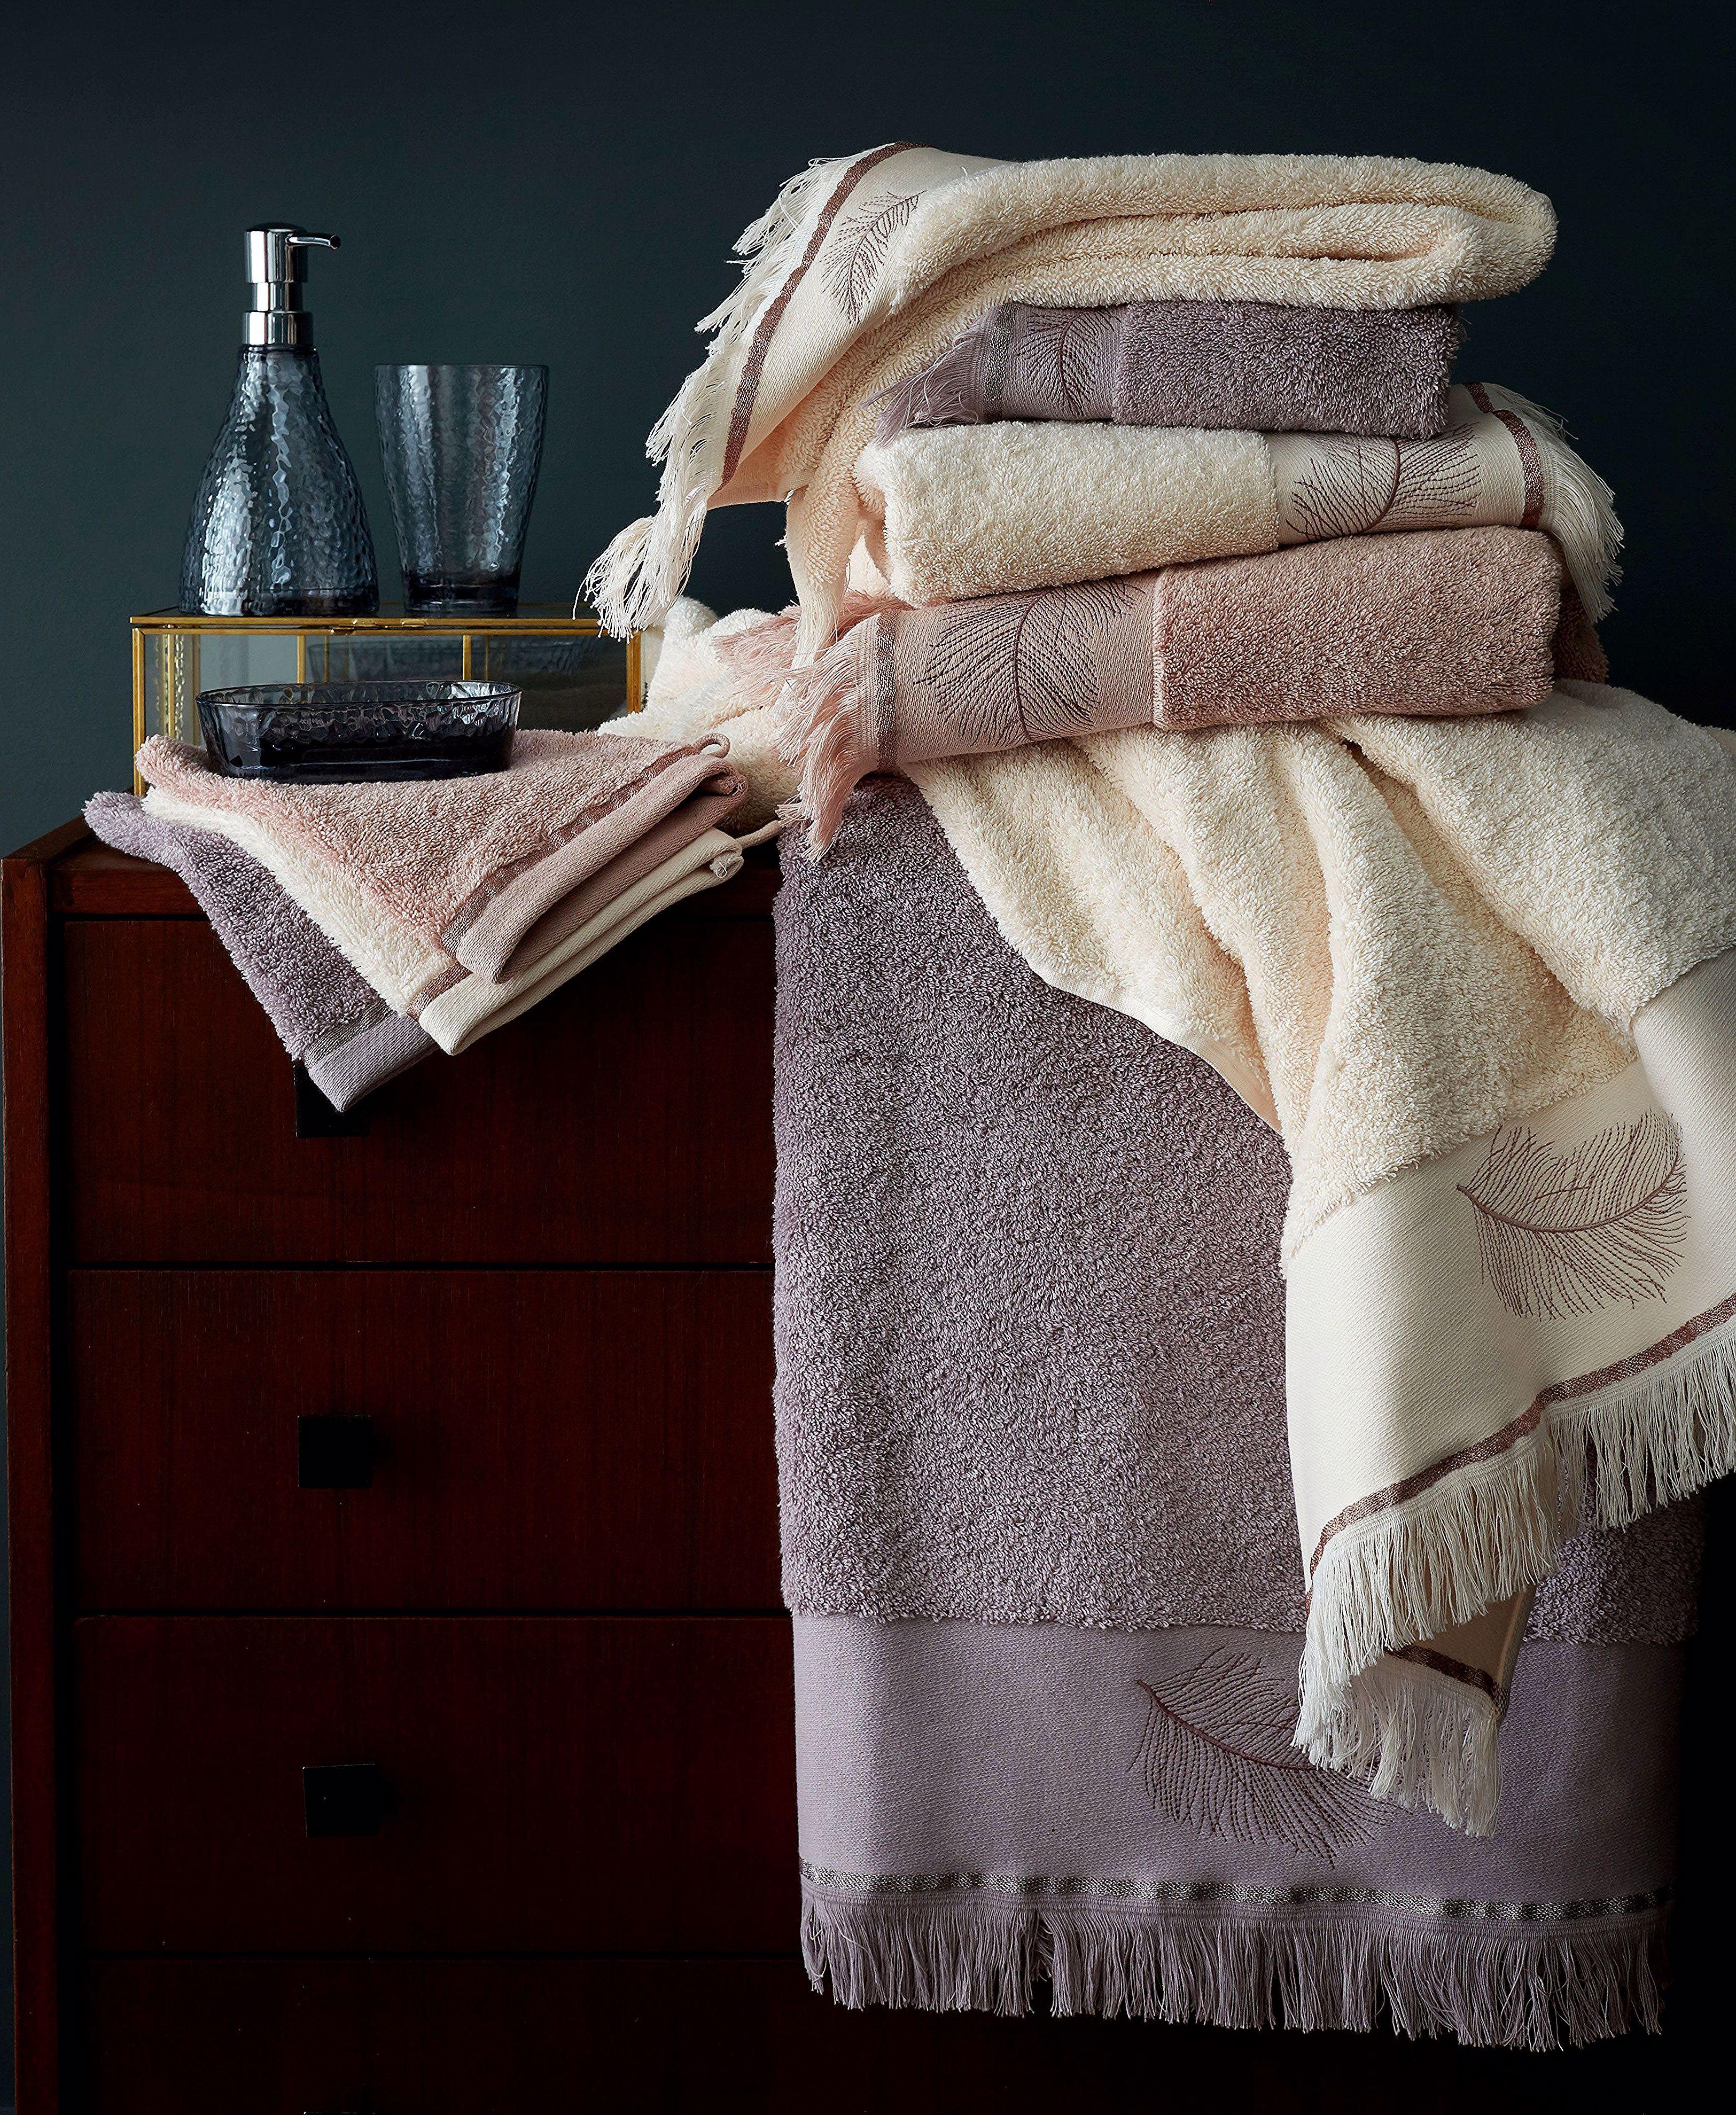 Pin By Brian Nicolas On Serviette Peignoir Bath Towels Luxury Towel Bath Towels